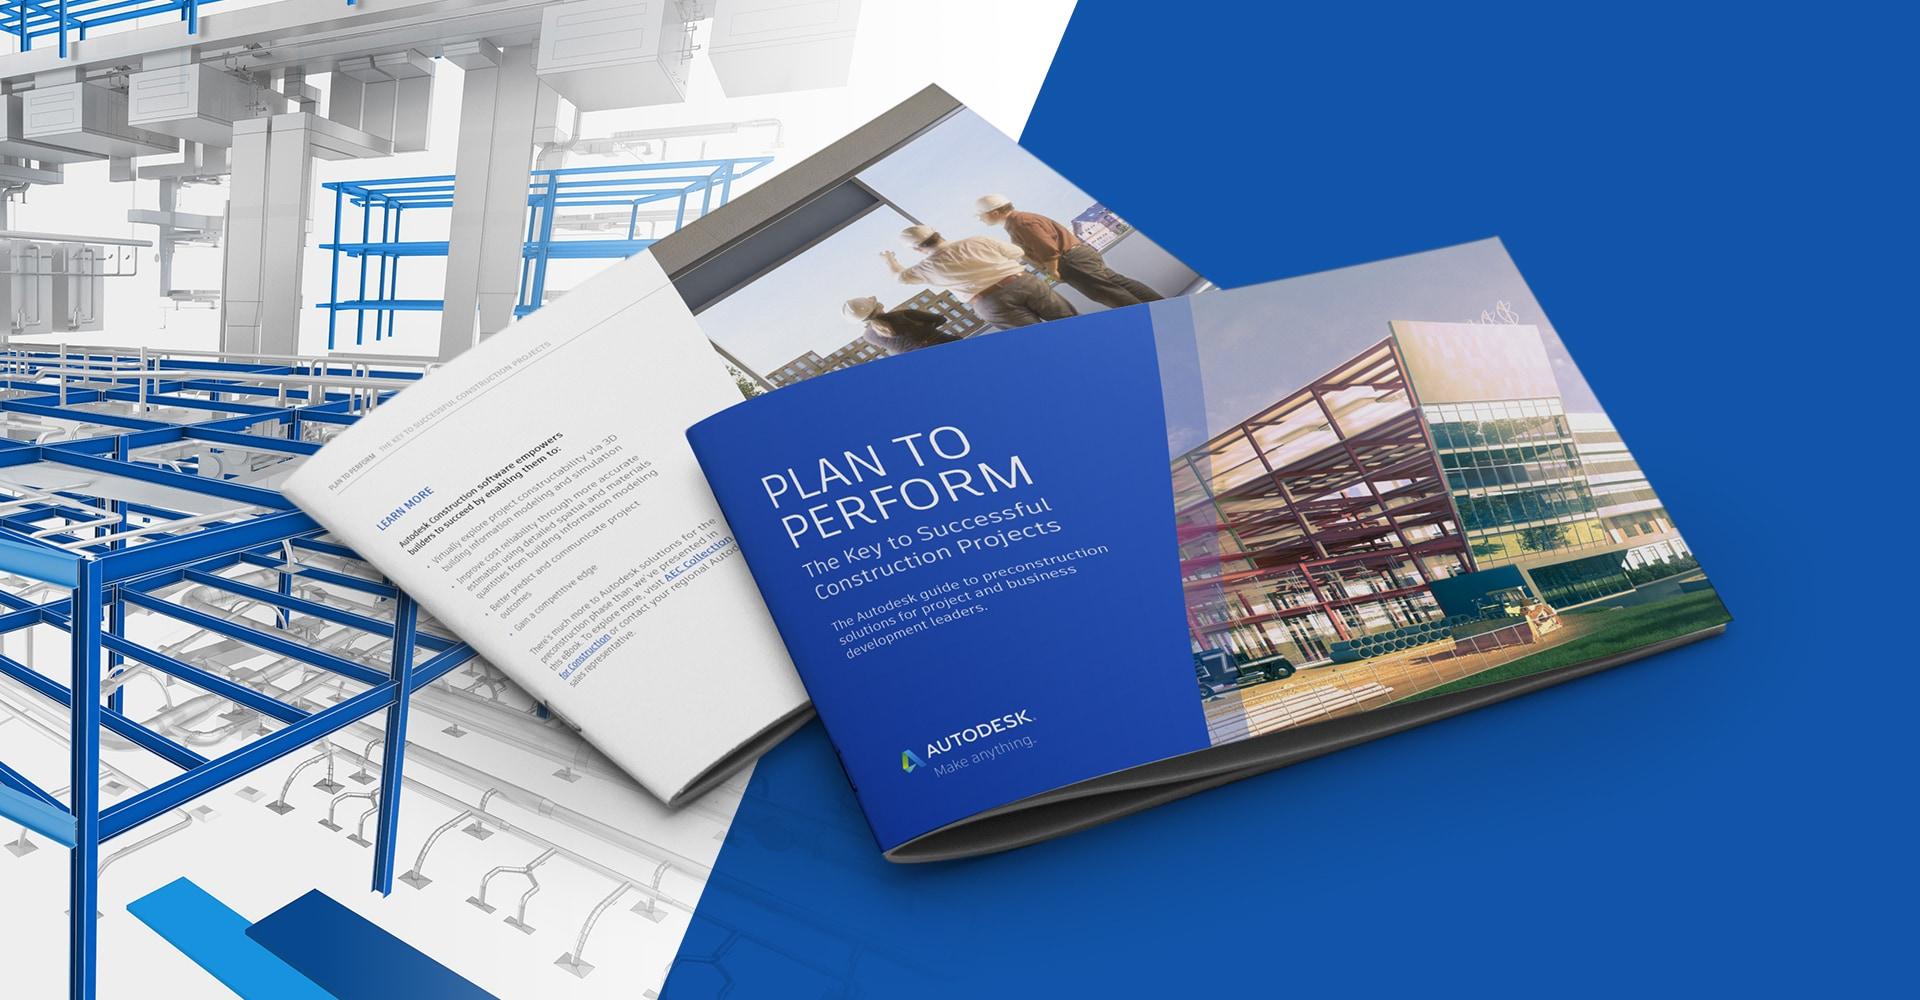 Construction Management Software Bim Autodesk